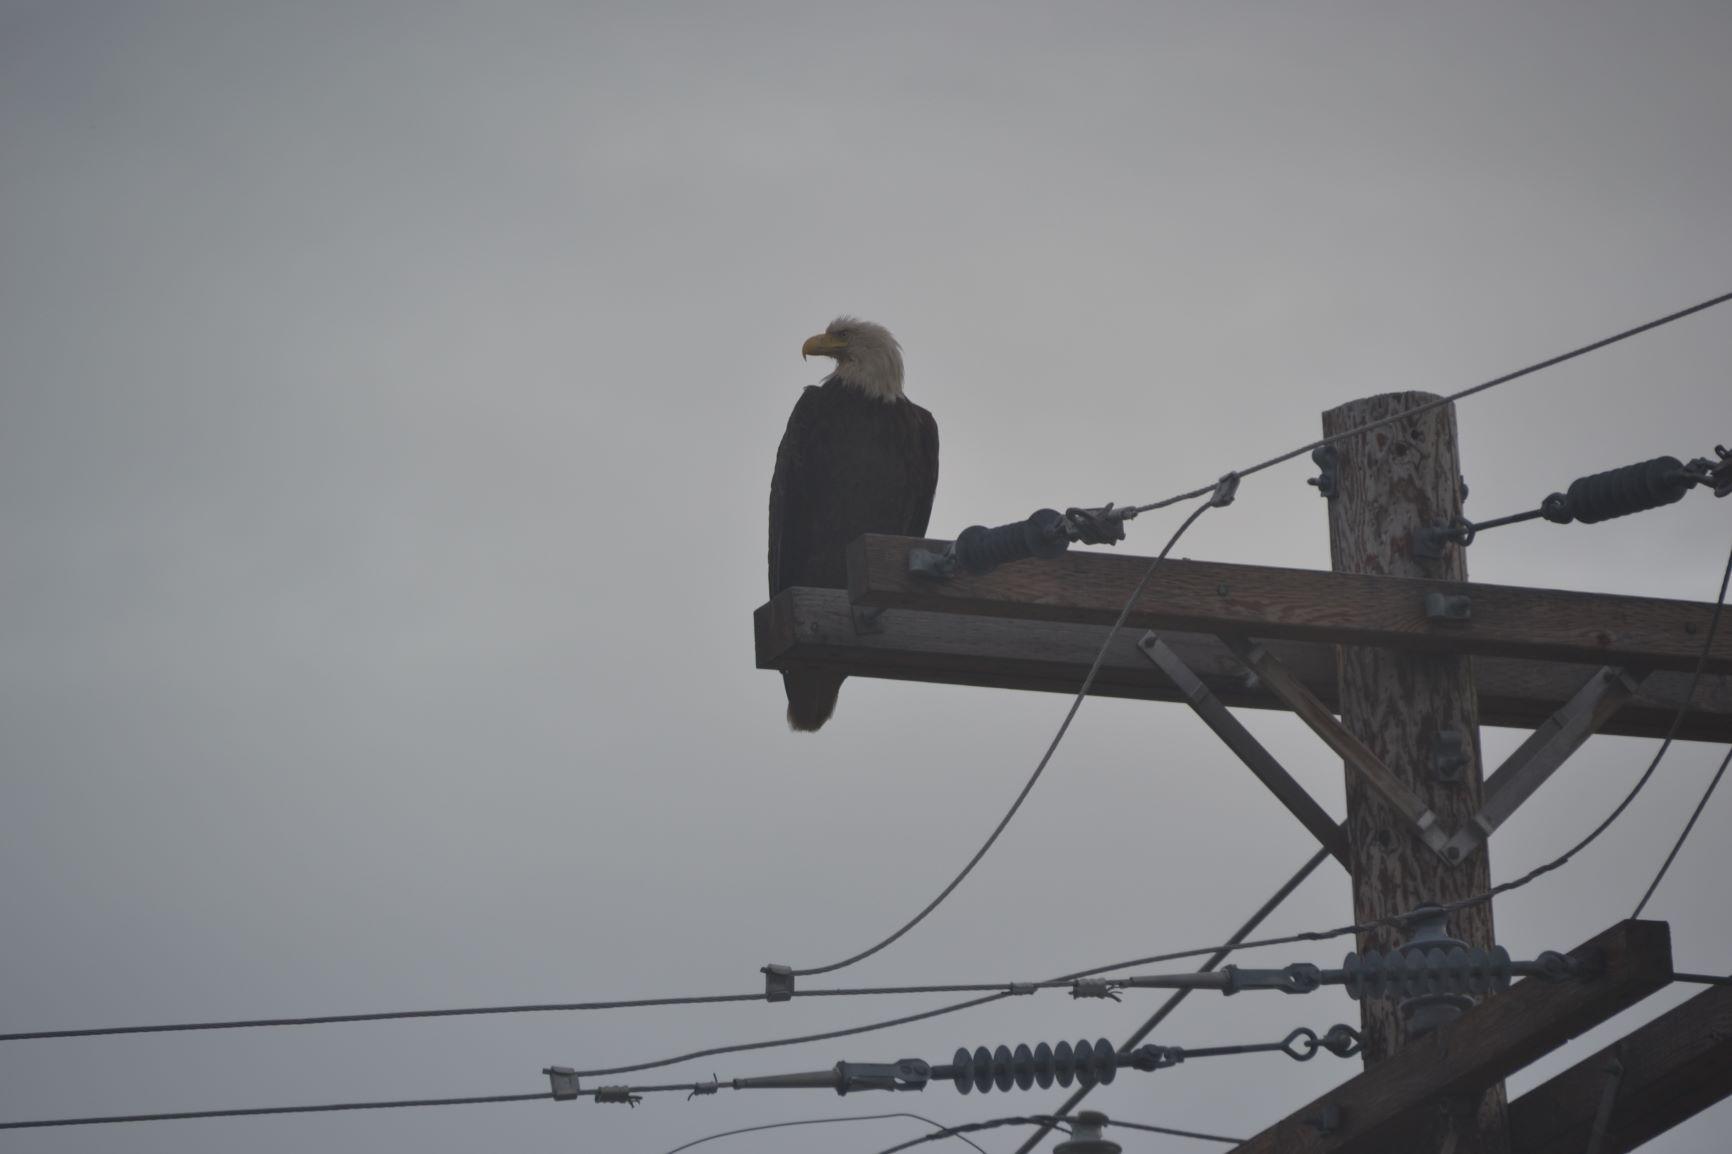 Eagle_on_telephone_pole.jpg